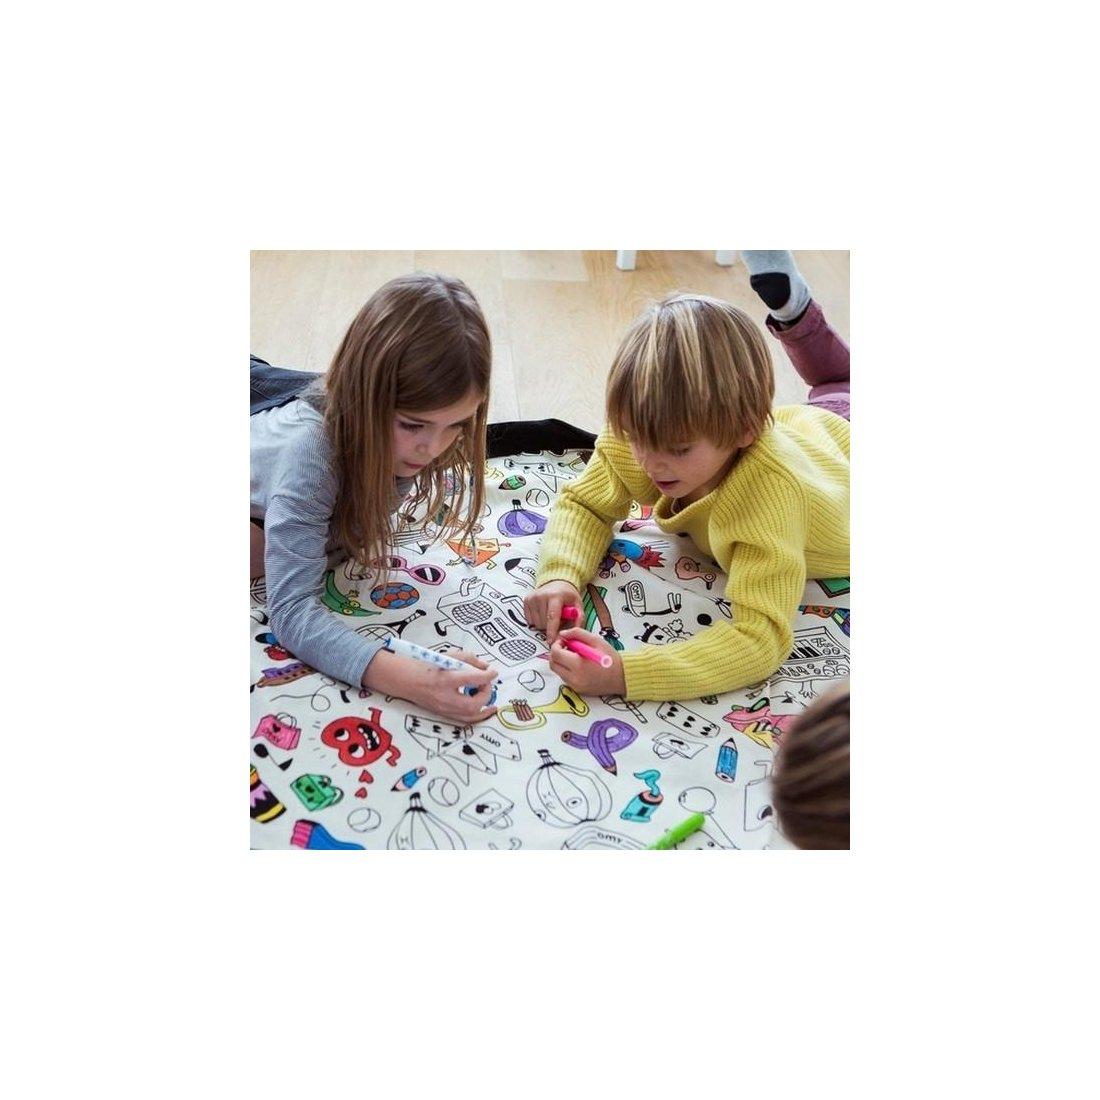 Bolsa de almacenaje y orden para juguetes de play go tubebebox - Almacenaje de juguetes ...